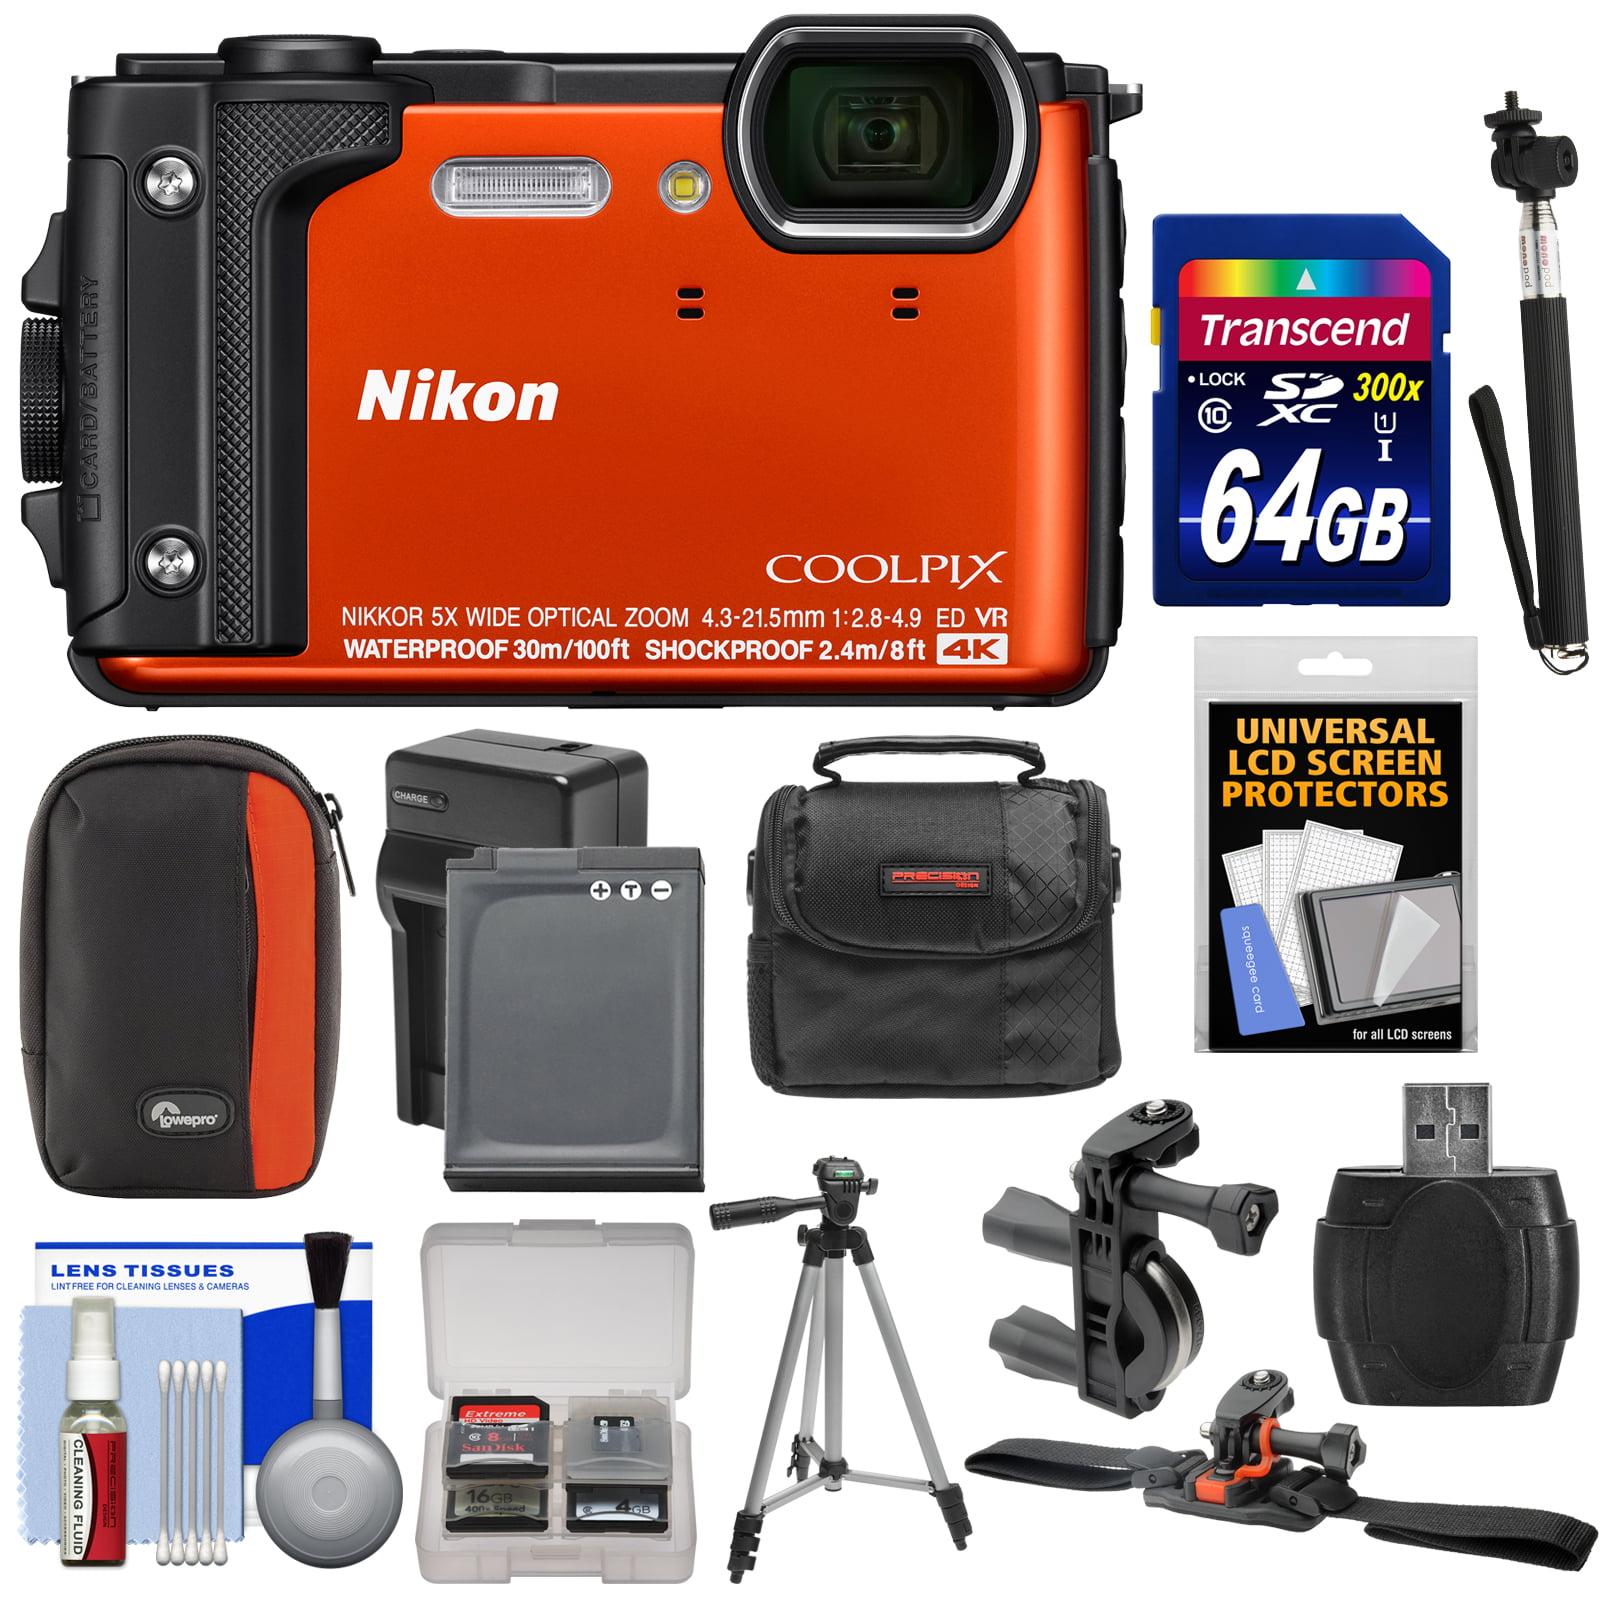 Nikon Coolpix W300 4K Wi-Fi Shock & Waterproof Digital Camera (Orange) with 64GB Card + (2) Cases + Battery & Charger + Tripod + Handlebar & Helmet Mounts + Kit